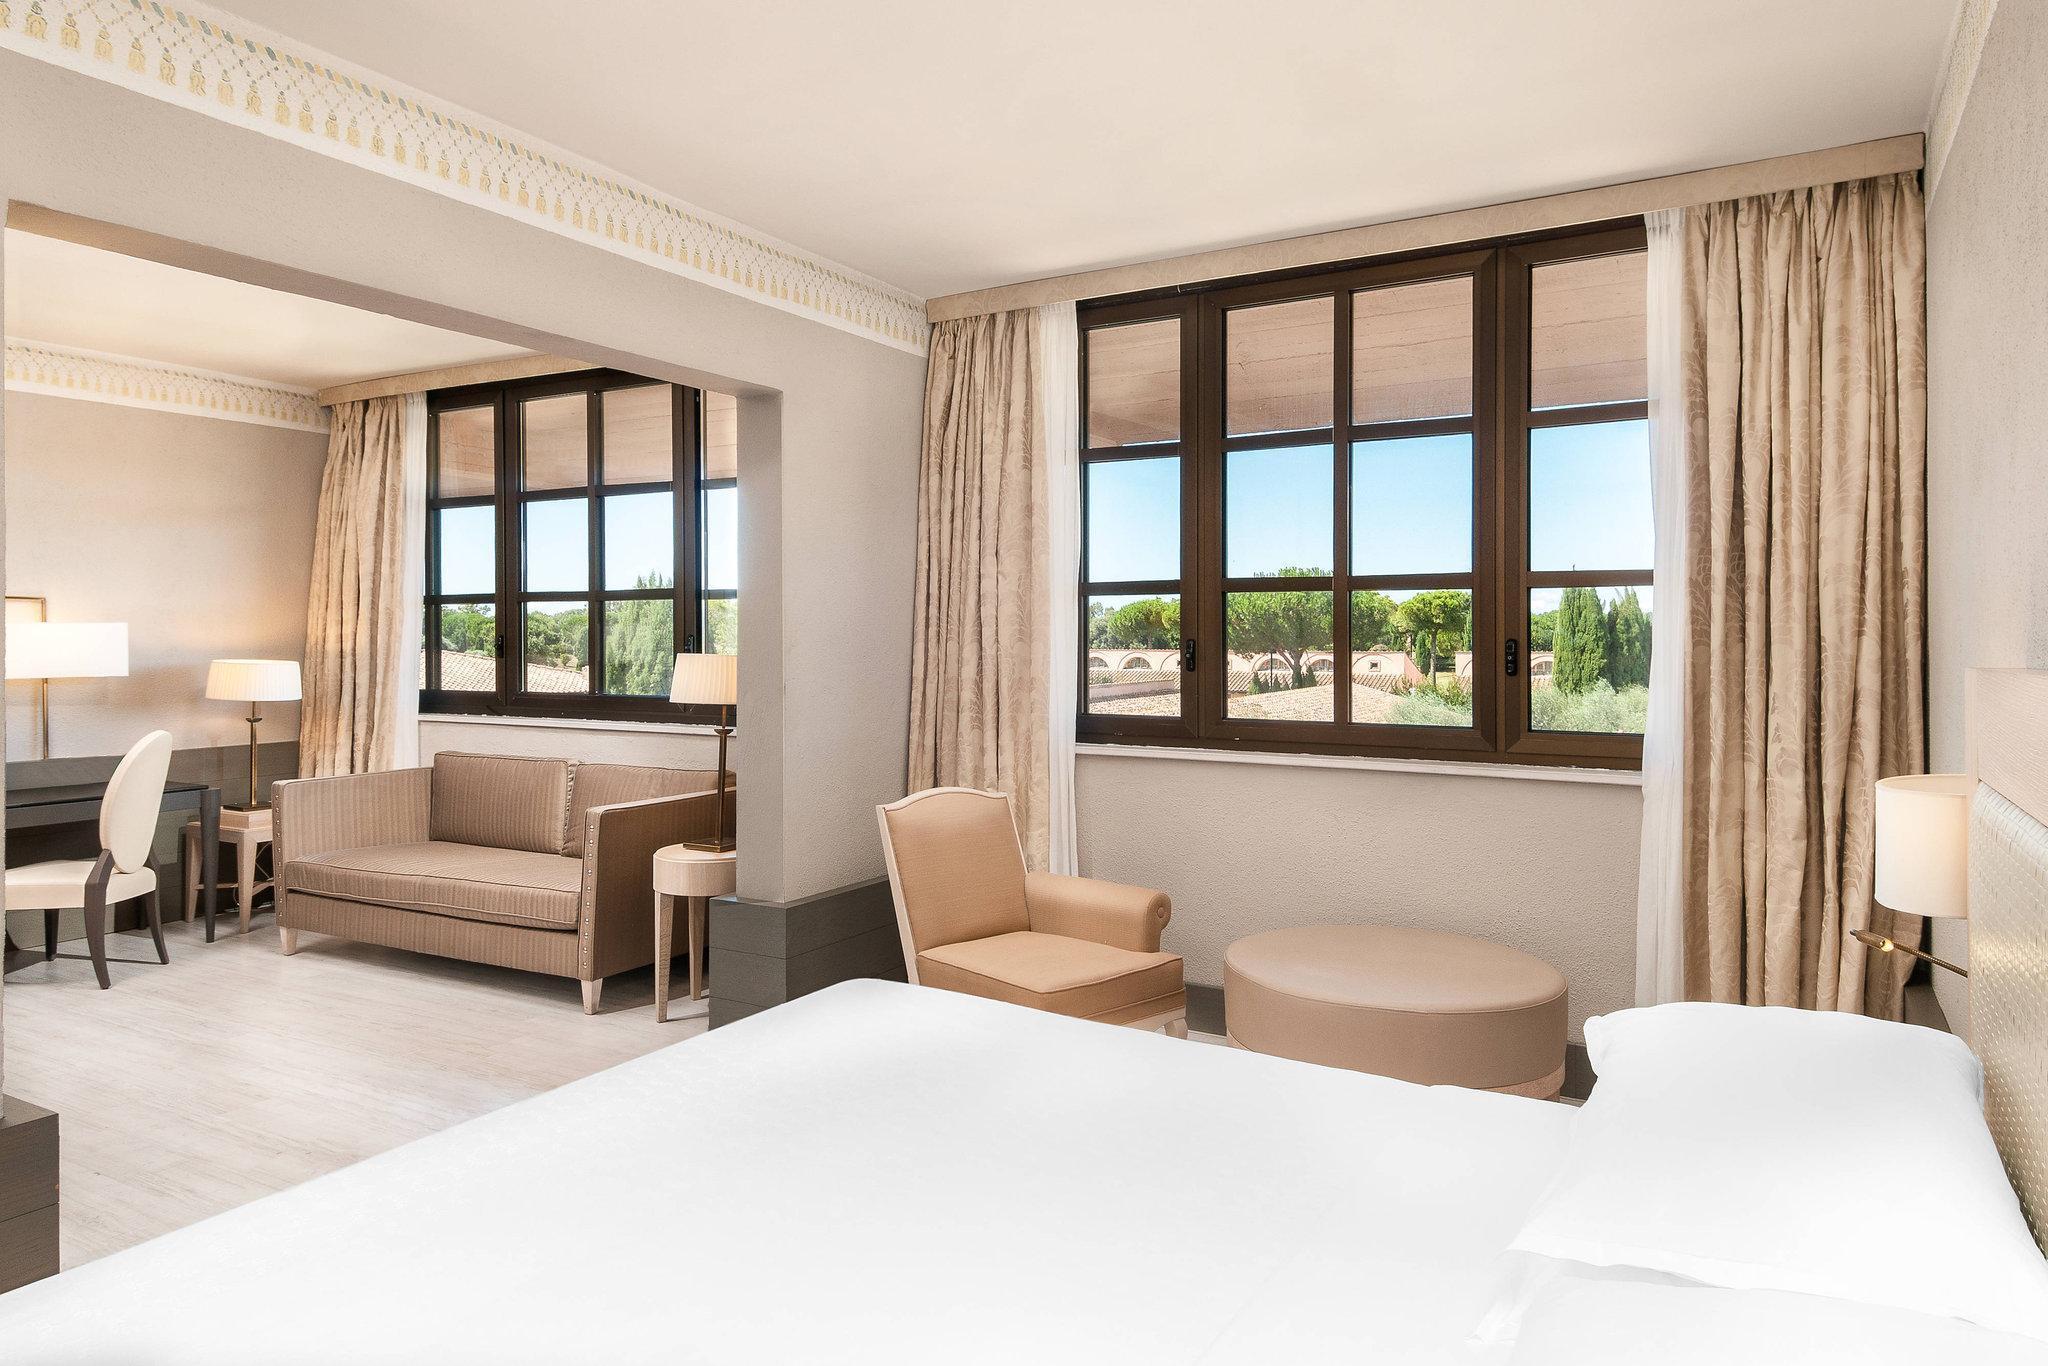 Sheraton Parco De Medici Rome Hotel In Italy Room Deals